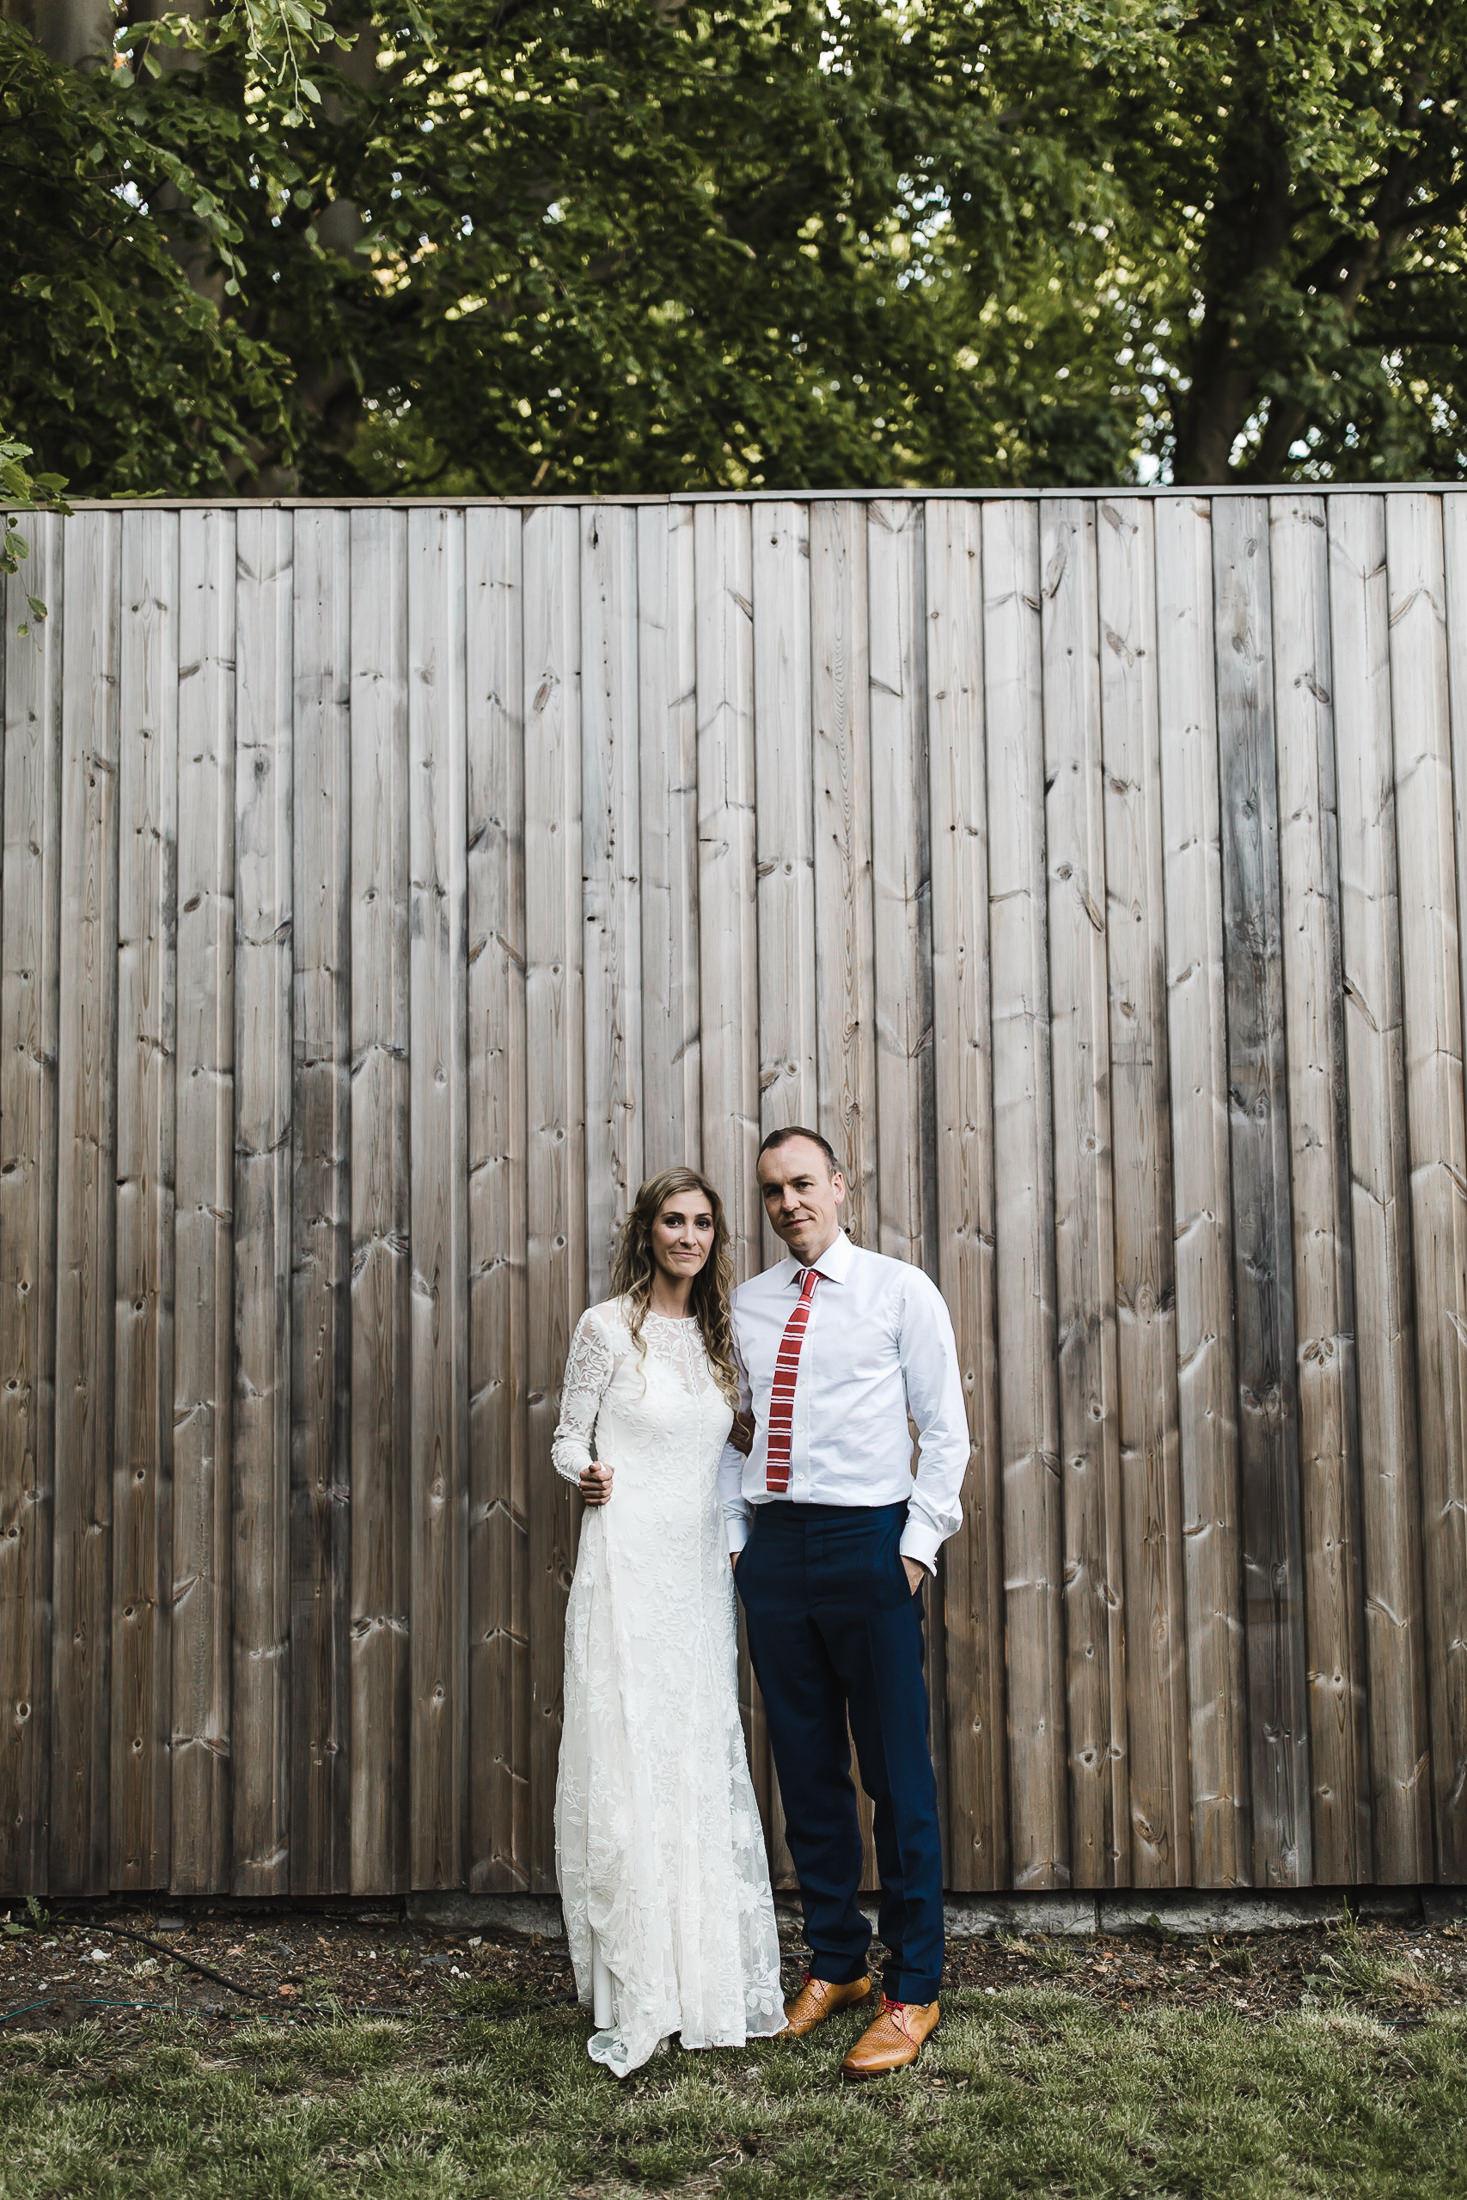 Roundhay-Leeds-Backyard-Wedding-Becs-Chris-180.jpg